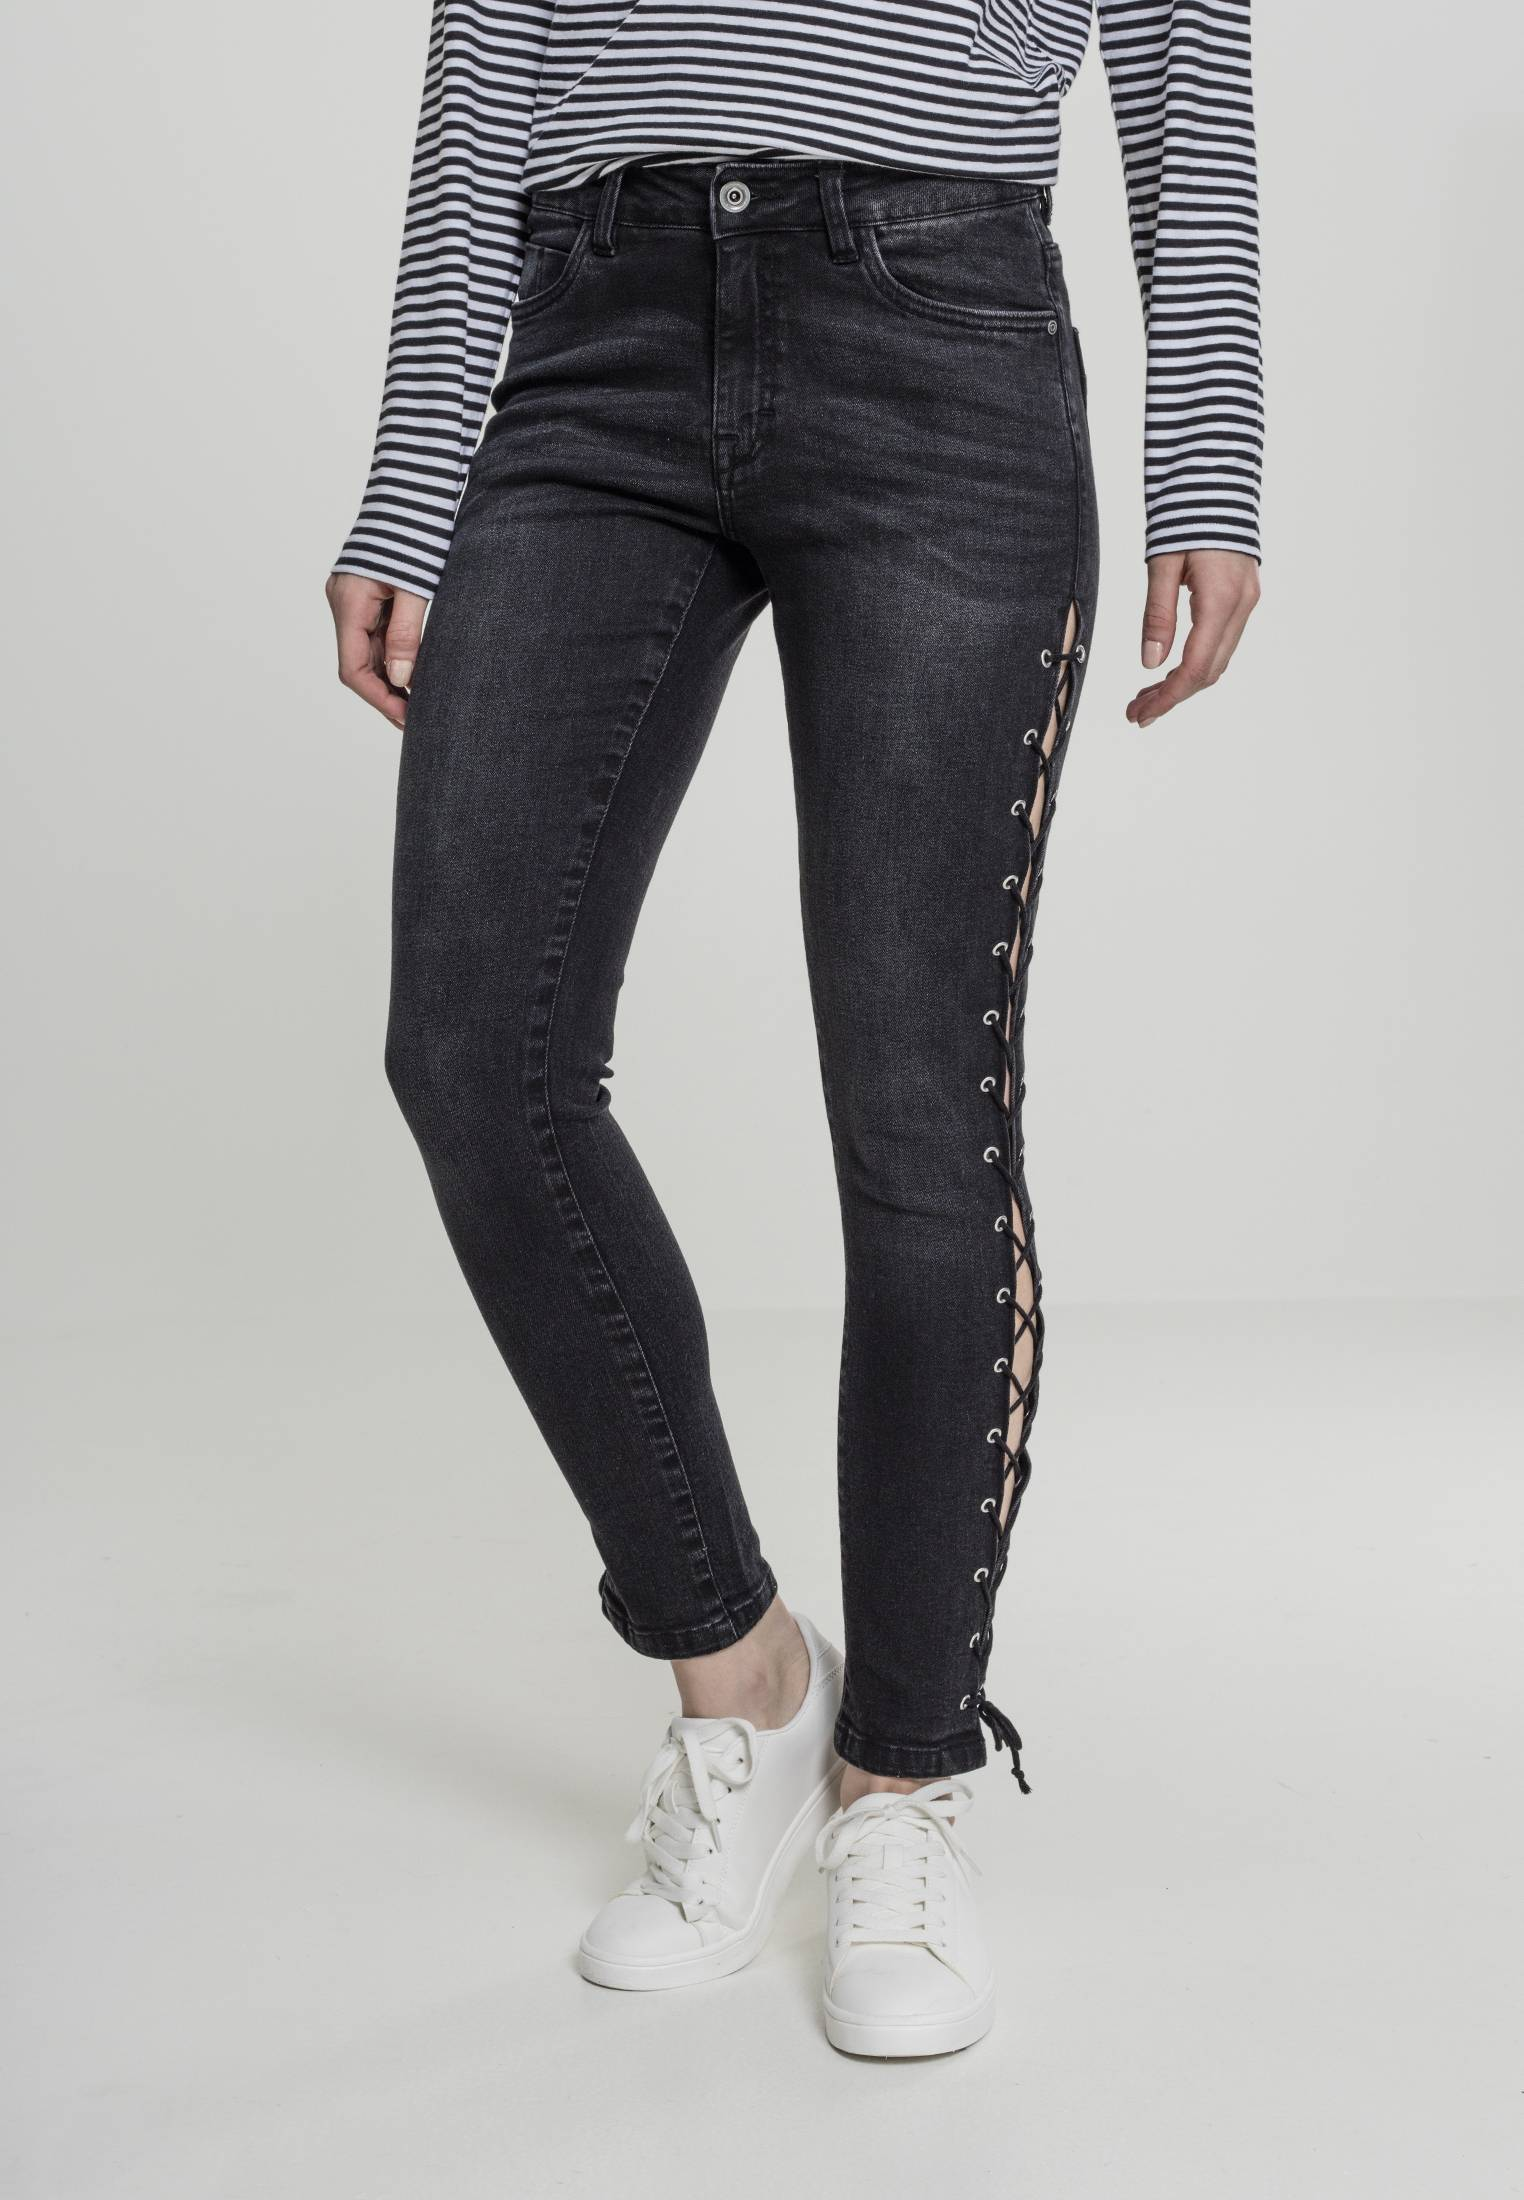 Urban Classics Ladies Denim Lace Up Skinny Pants black washed - 26